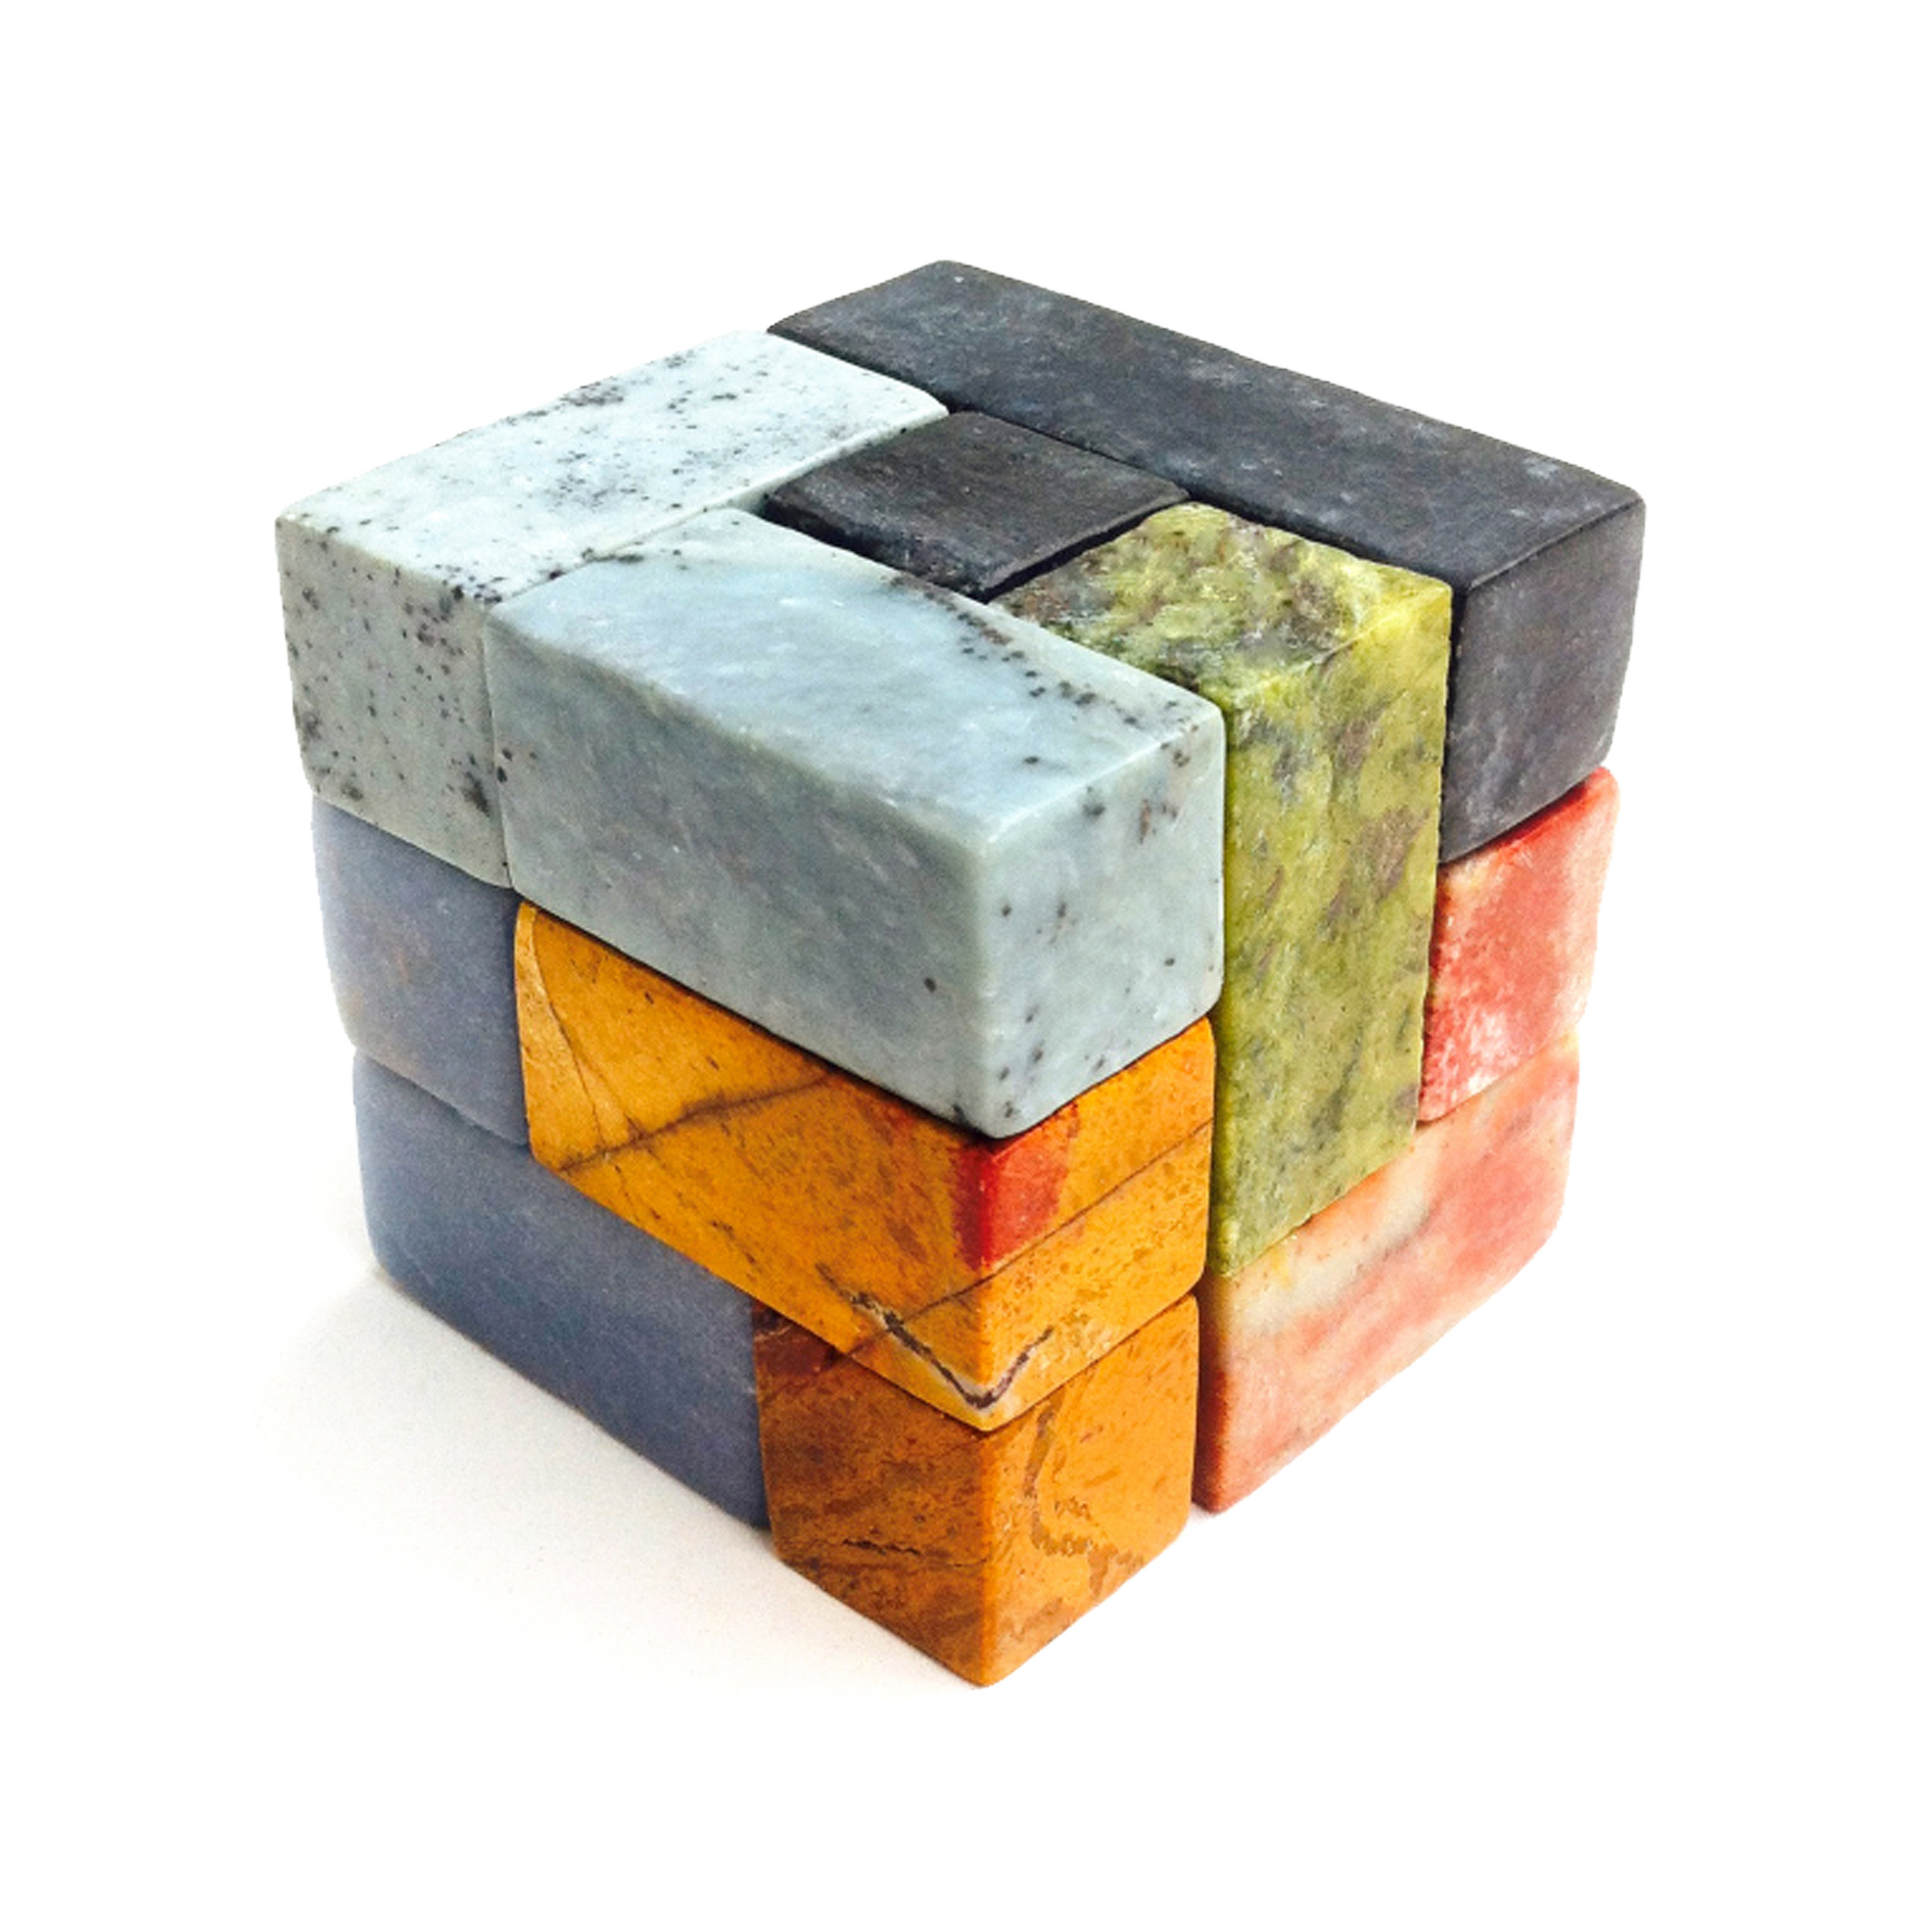 DAR-Projects-KUX-games-Cube.jpg